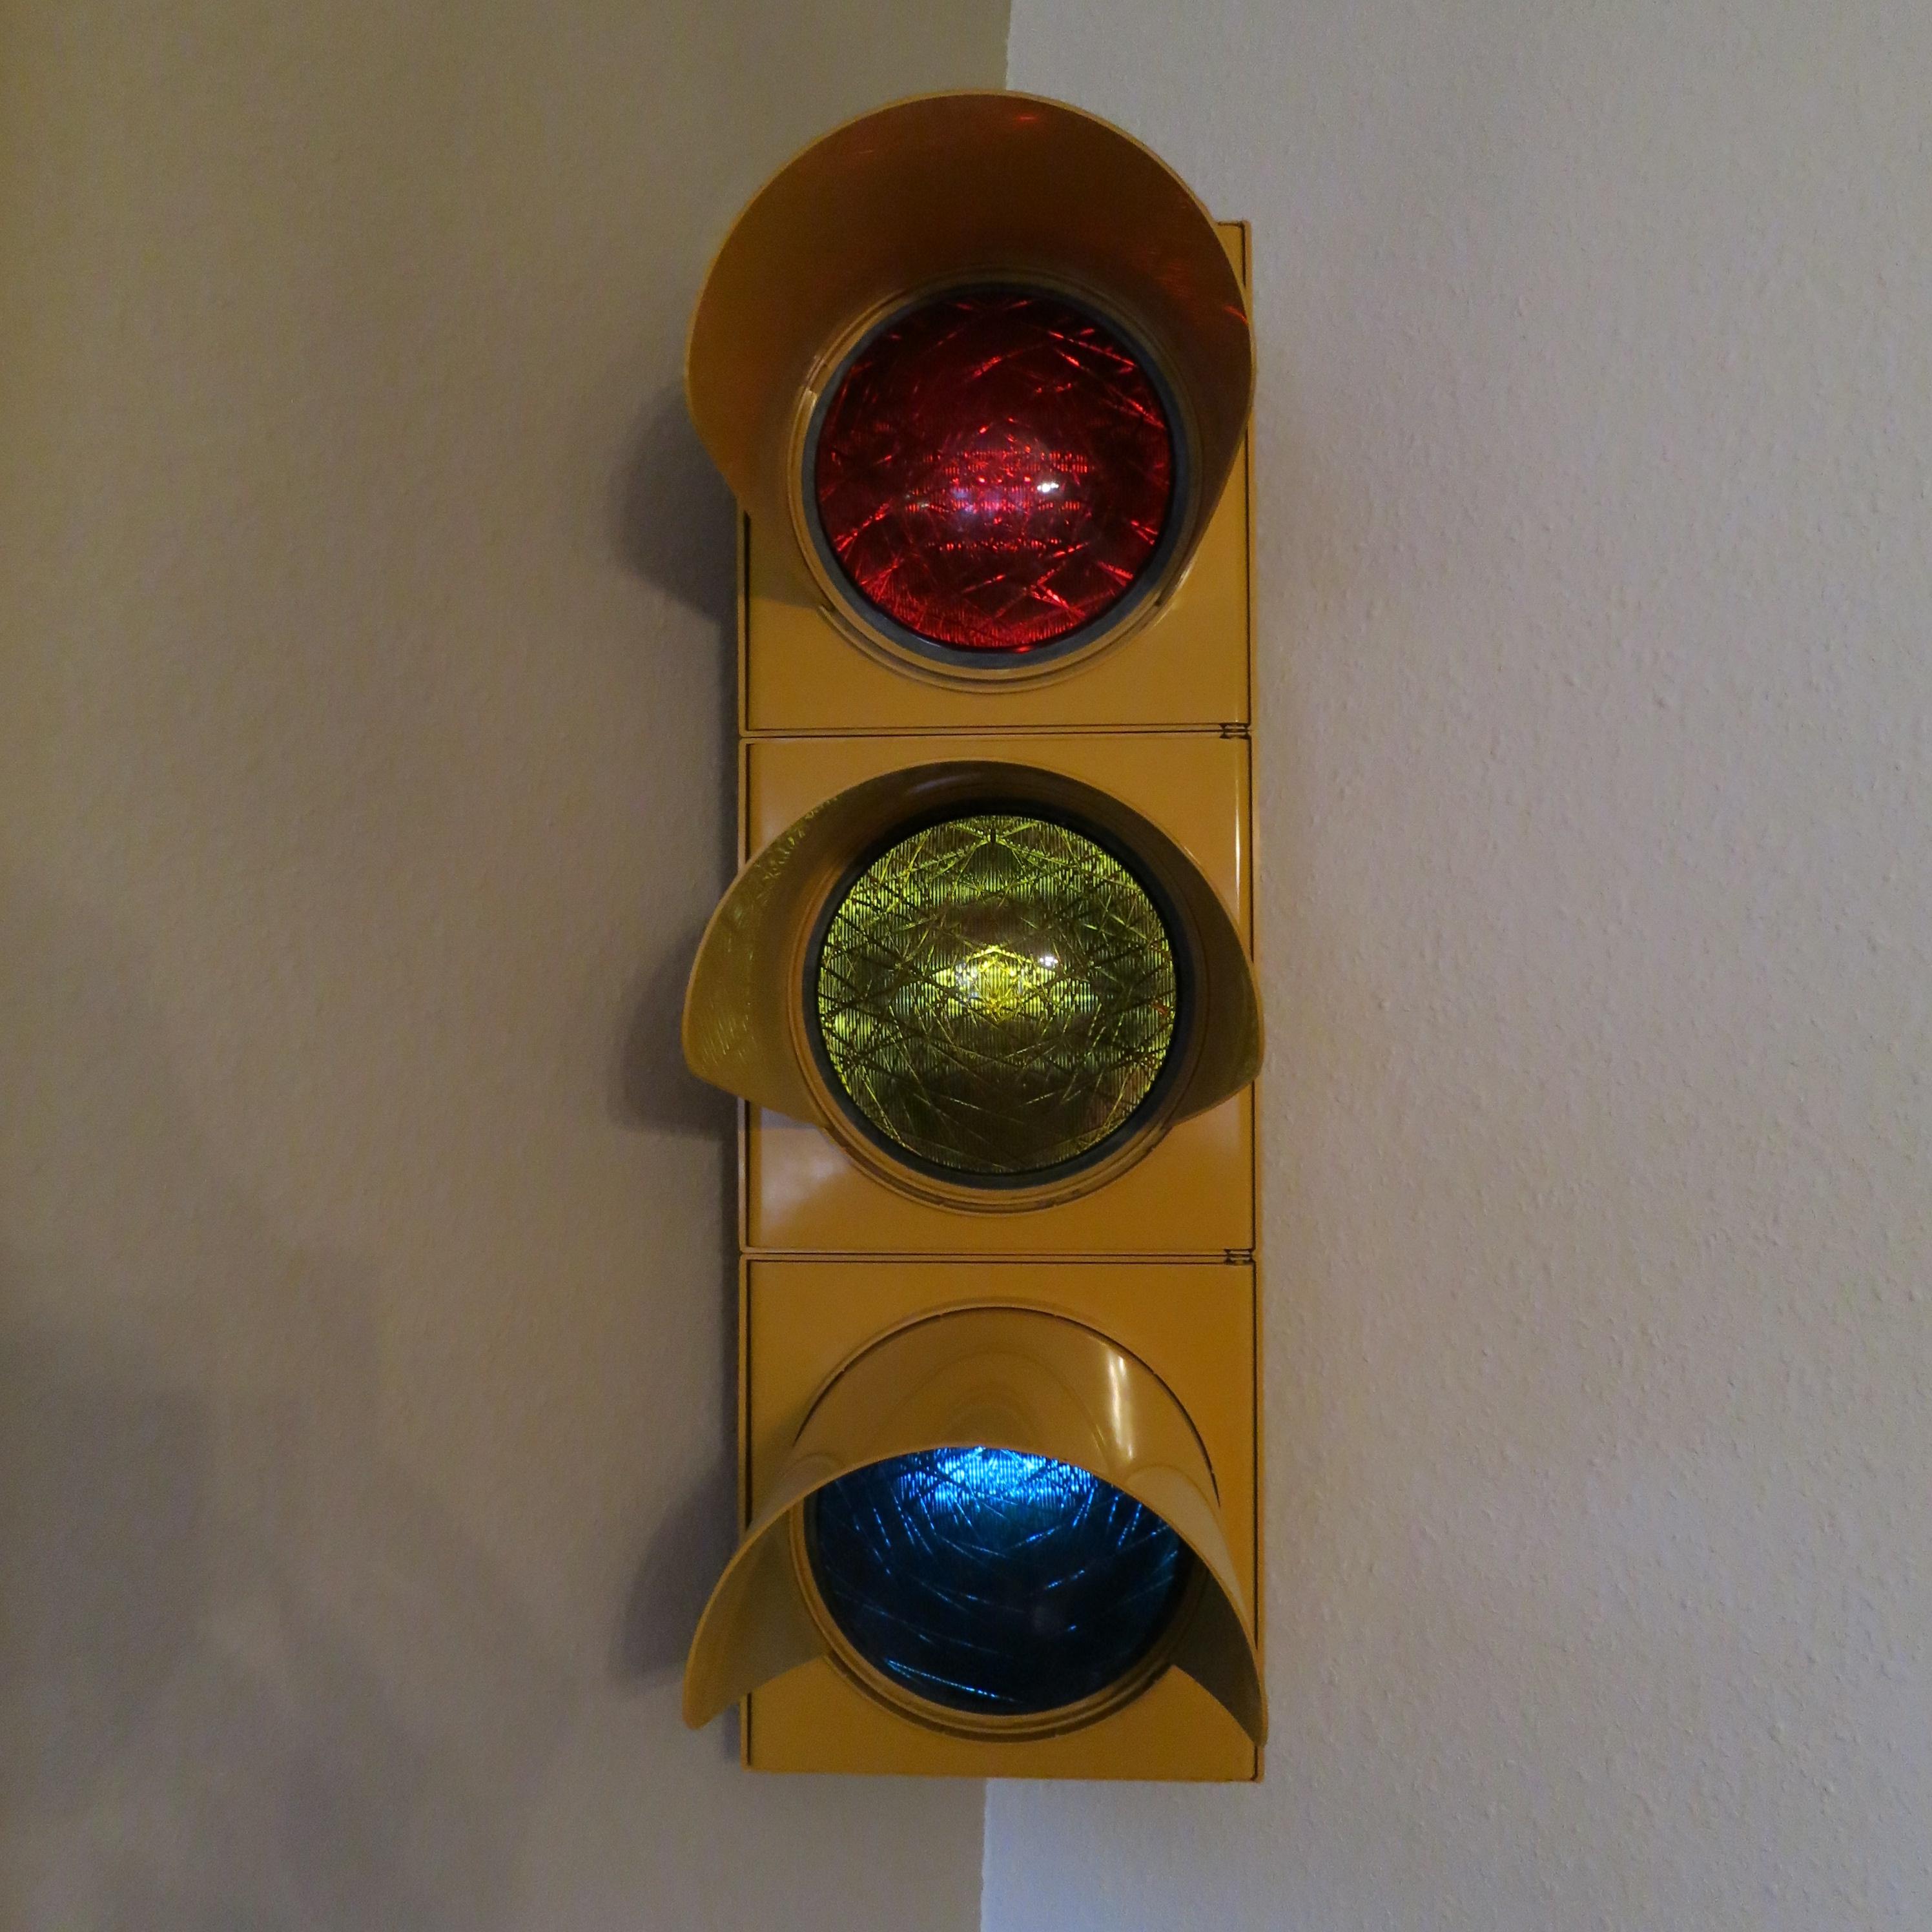 Ampel auf LED-Beleuchtung umgebaut 10 € zzgl. Versand